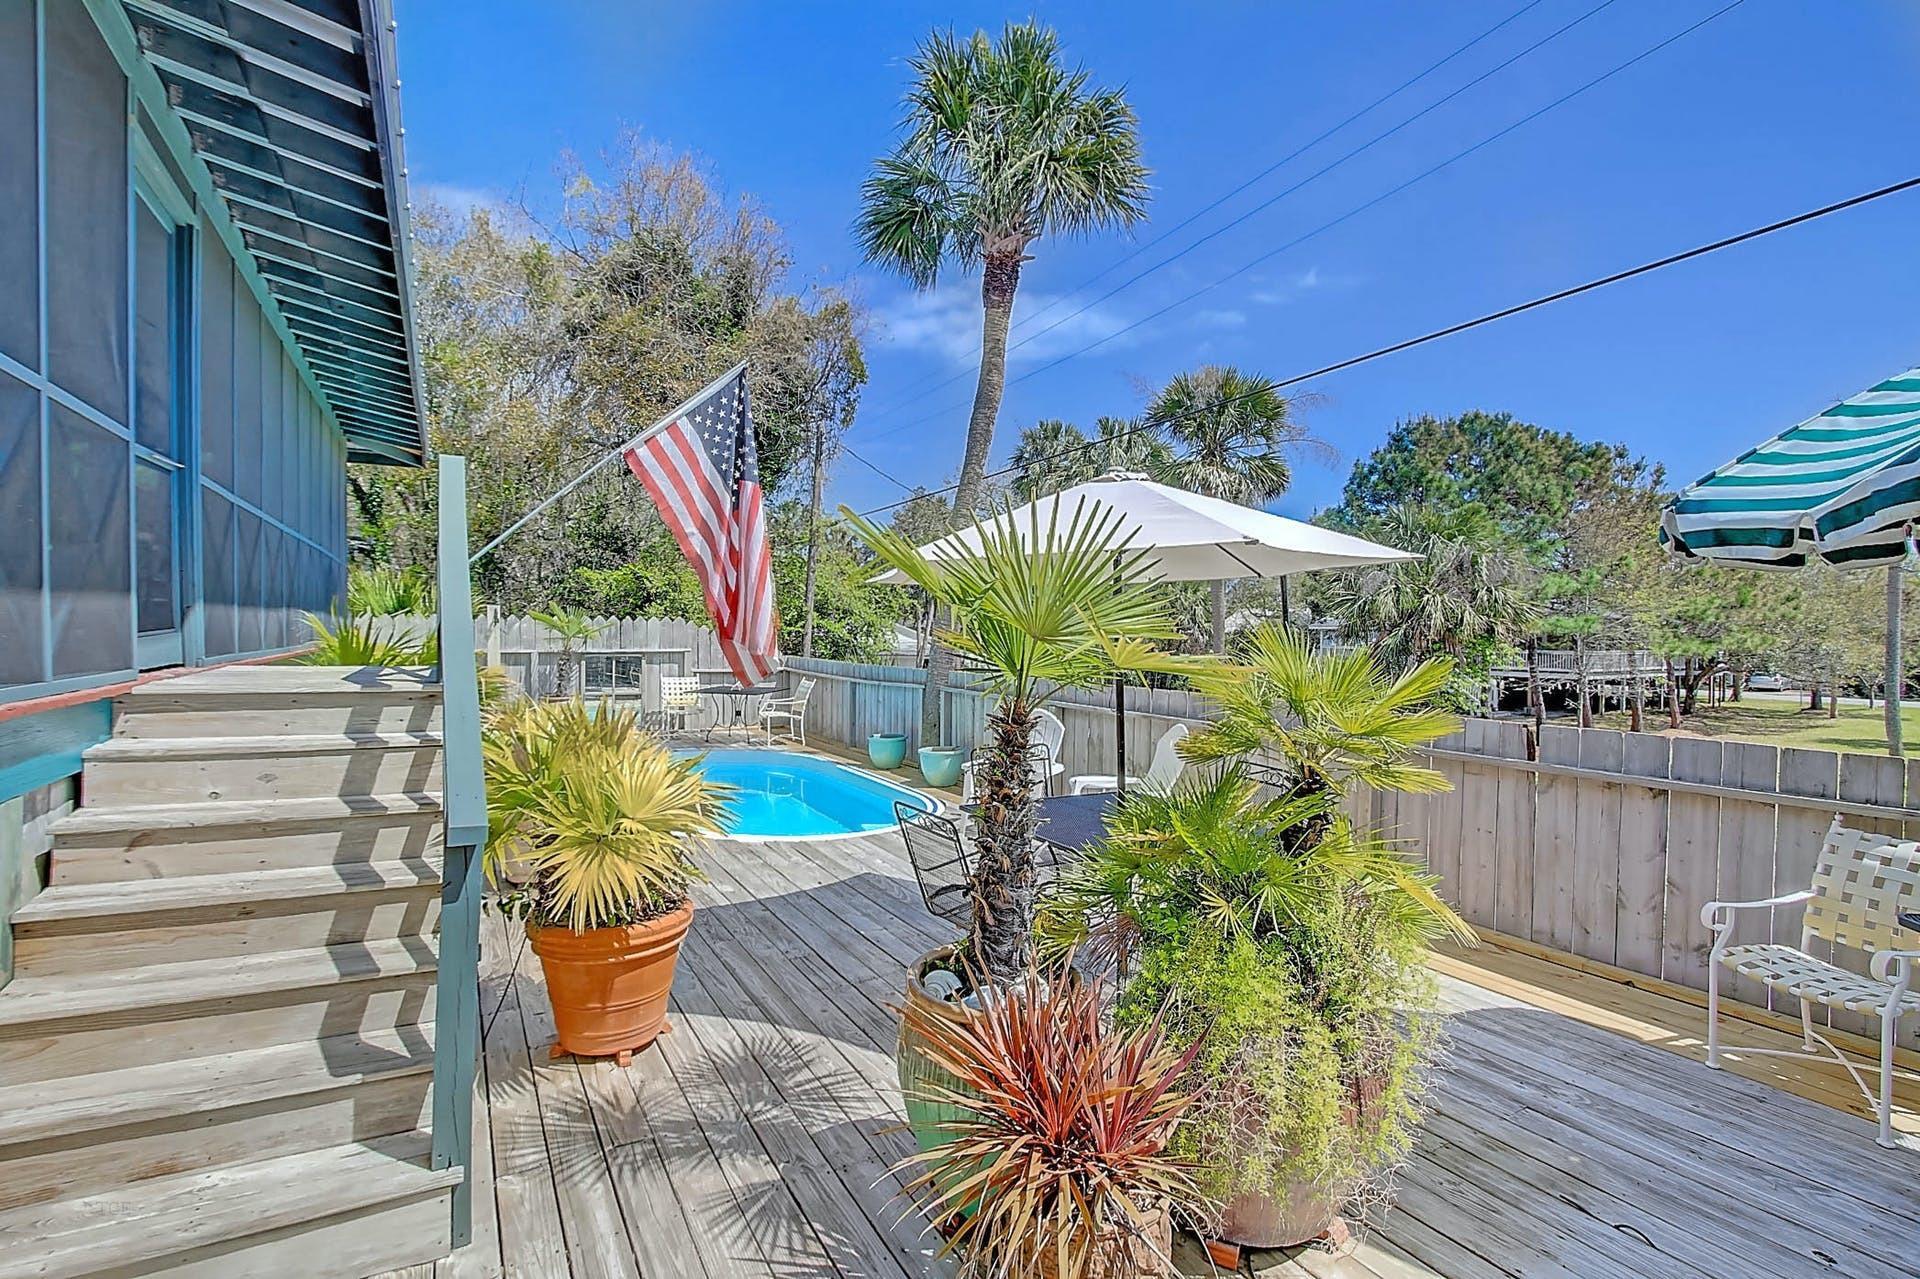 Folly Beach Homes For Sale - 306 Cooper, Folly Beach, SC - 32